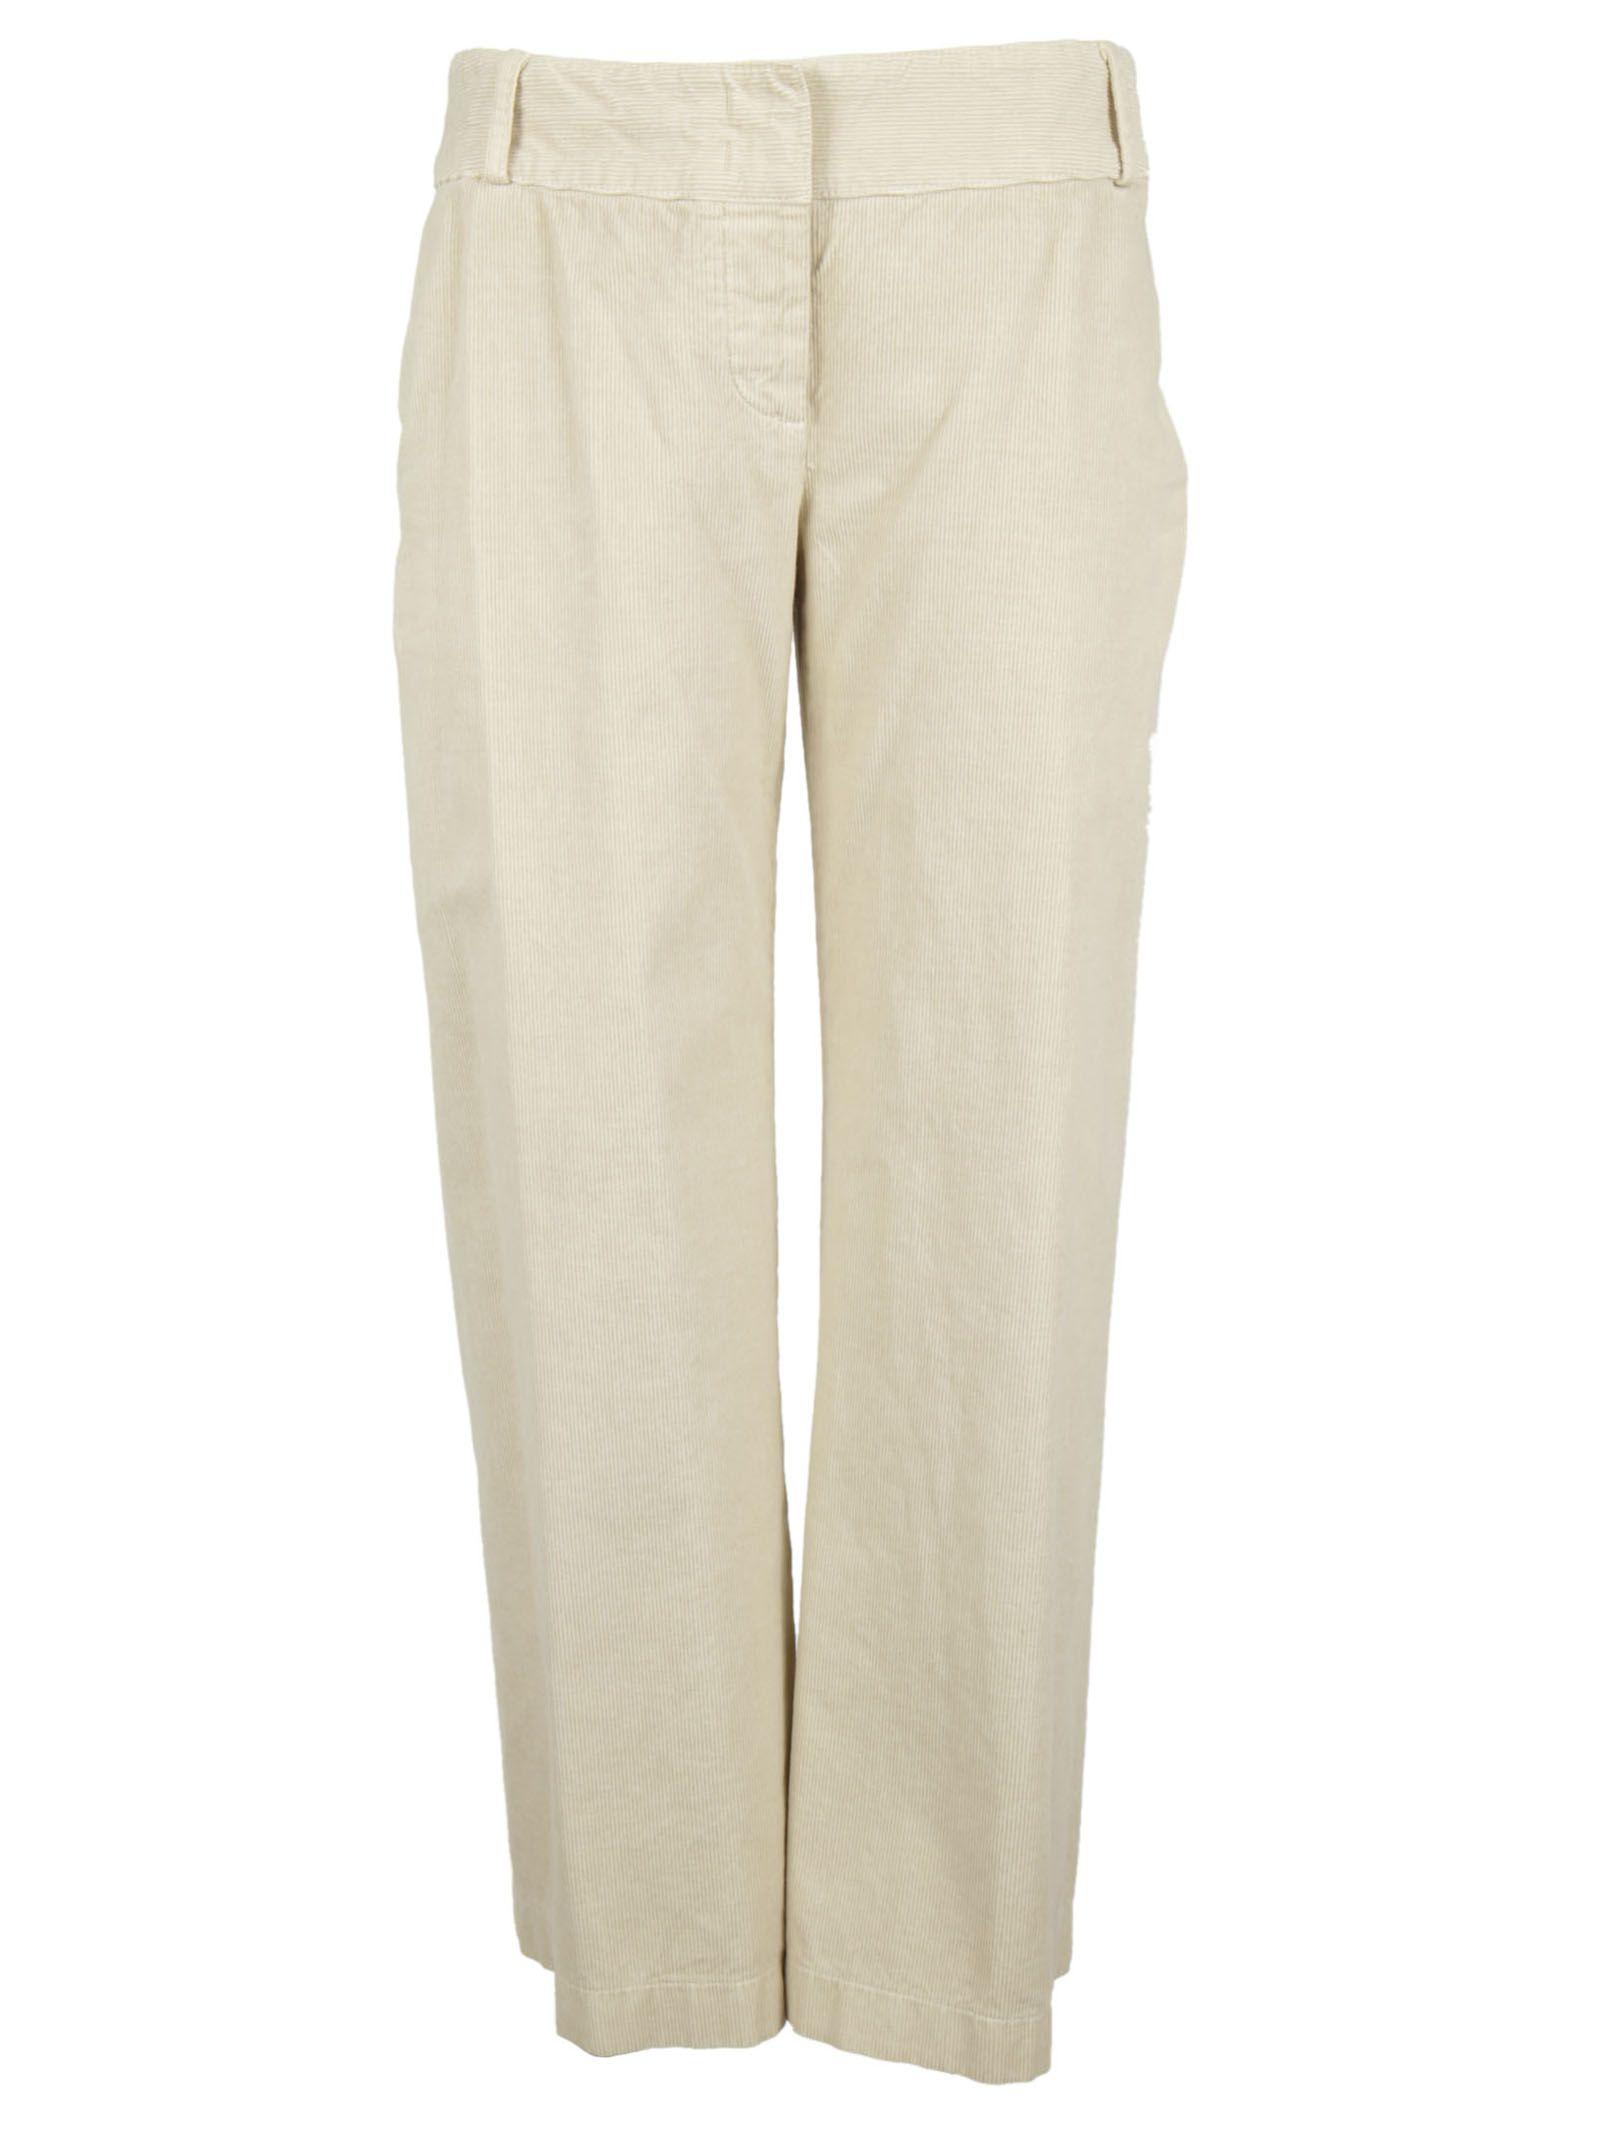 Aspesi Corduroy Trousers